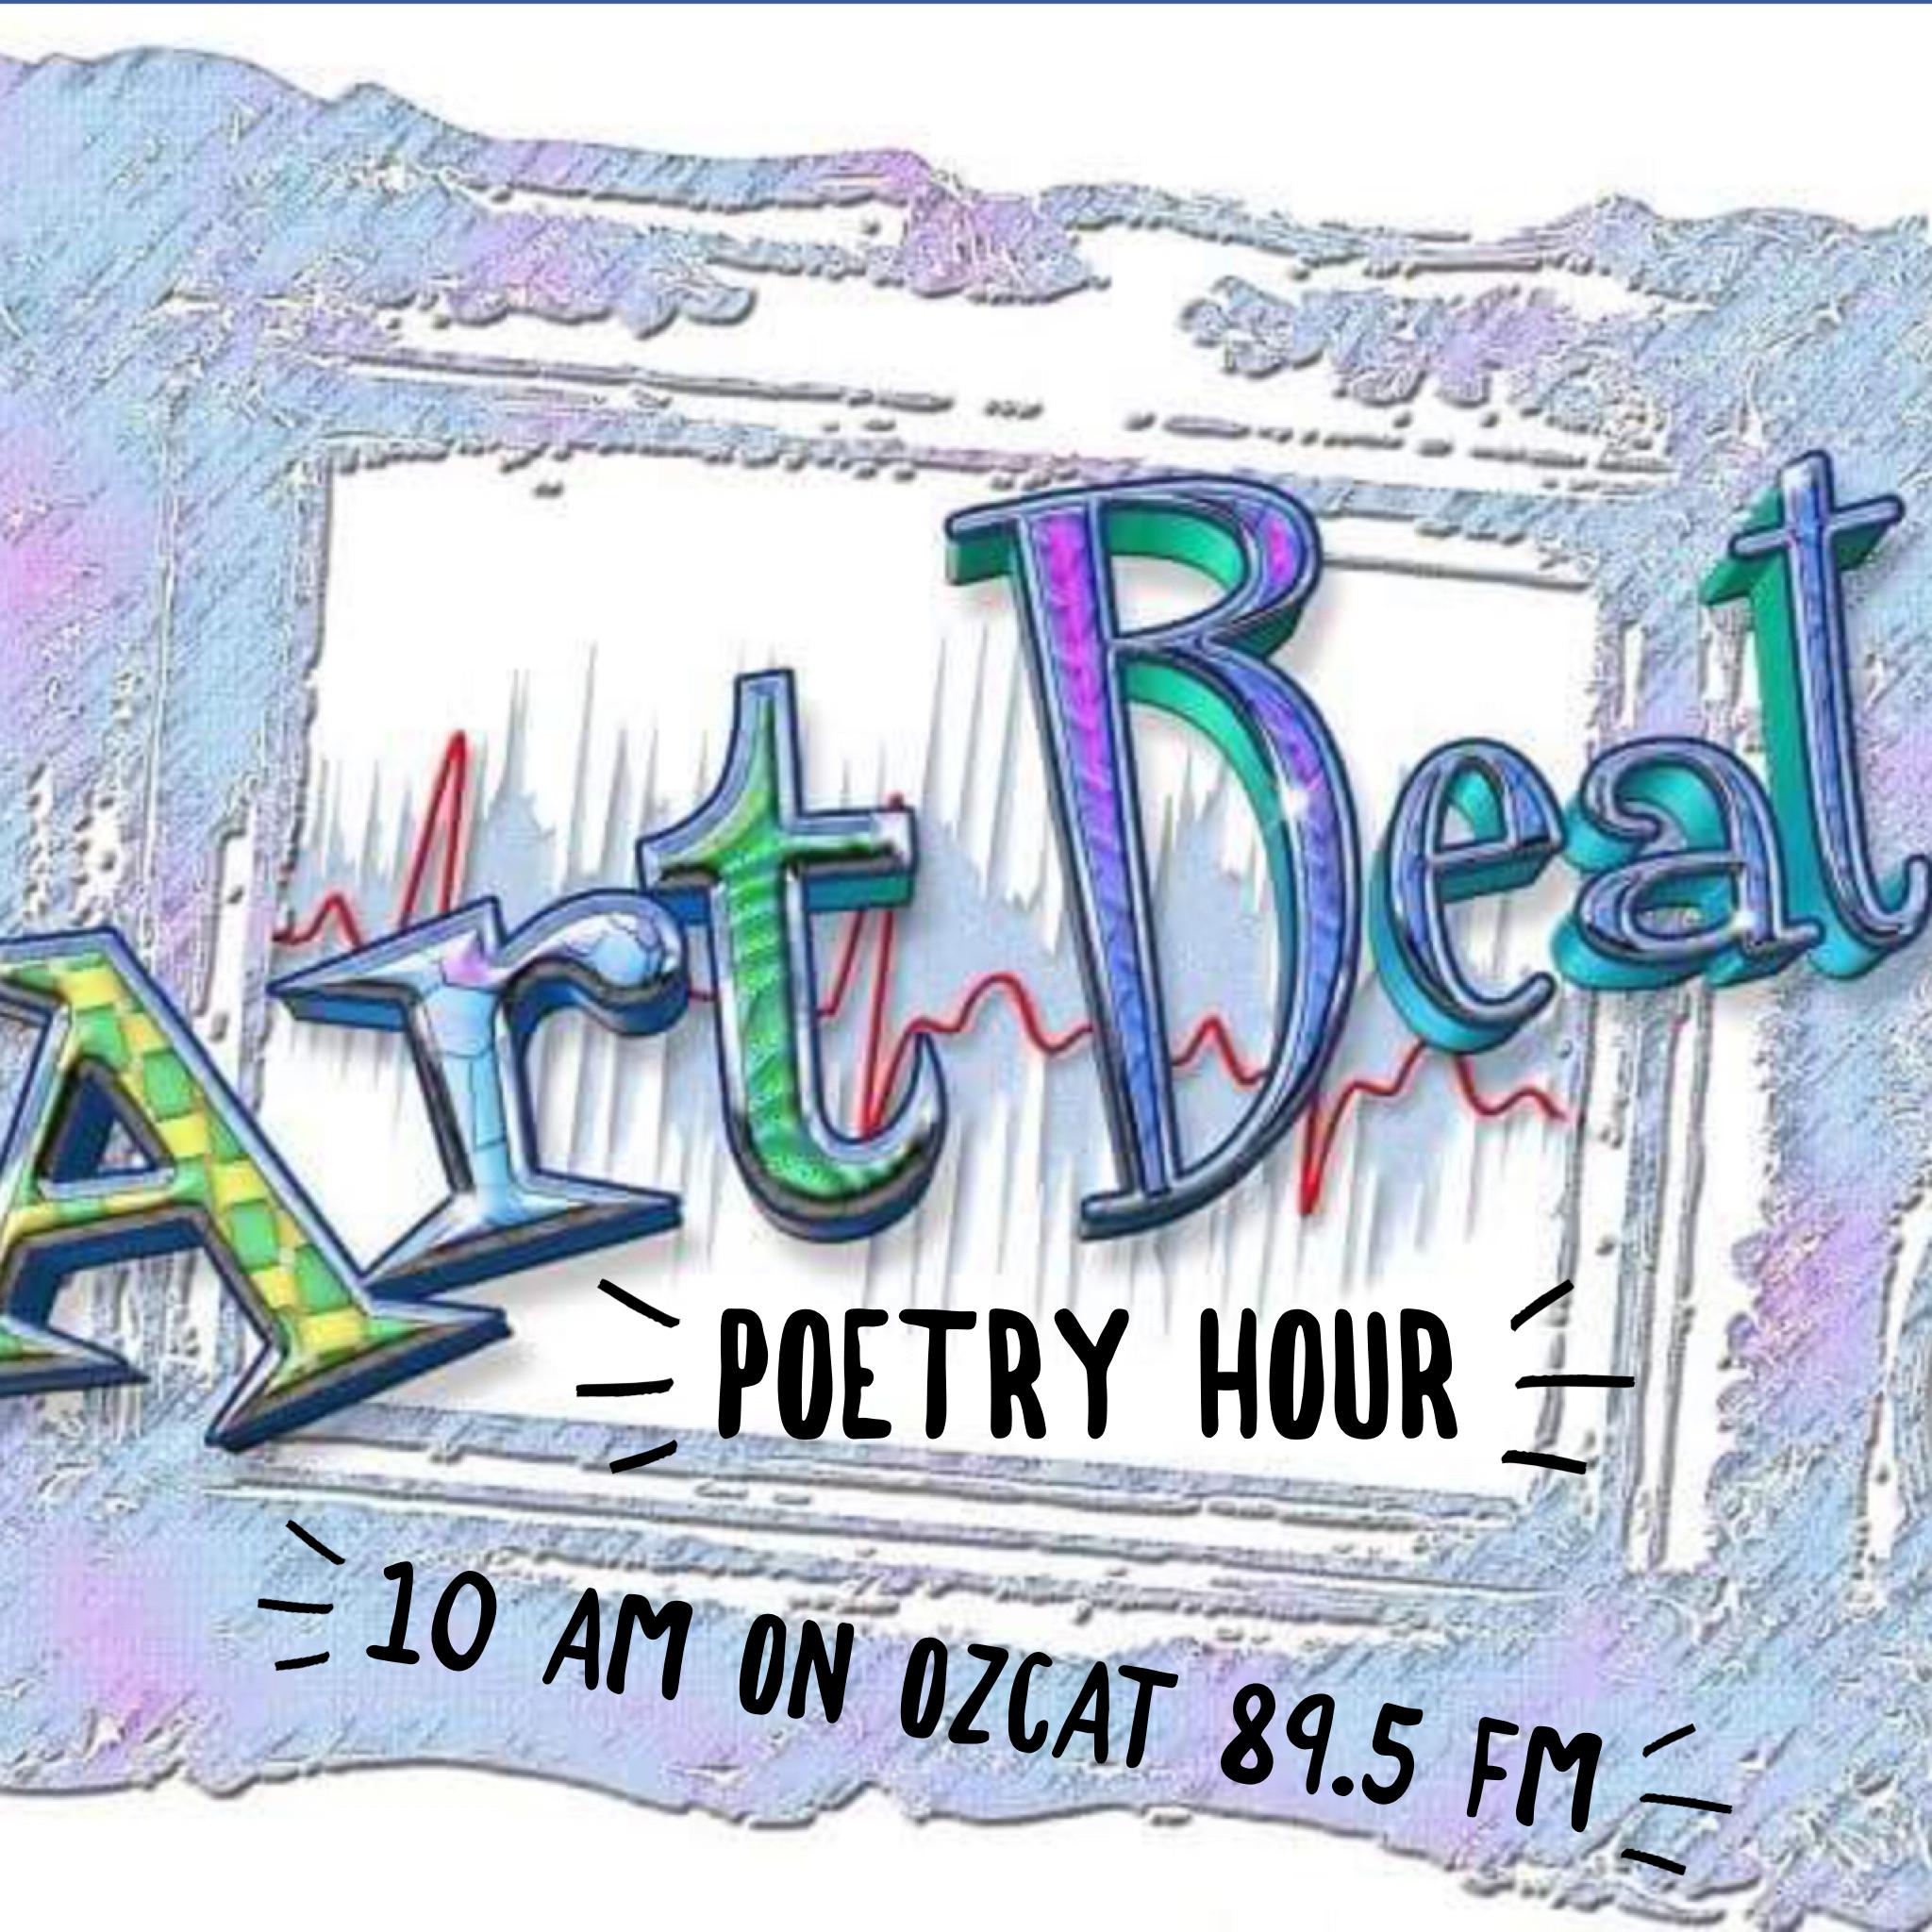 Art Beat Poetry Hour on Ozcat 89.5 FM KZCT